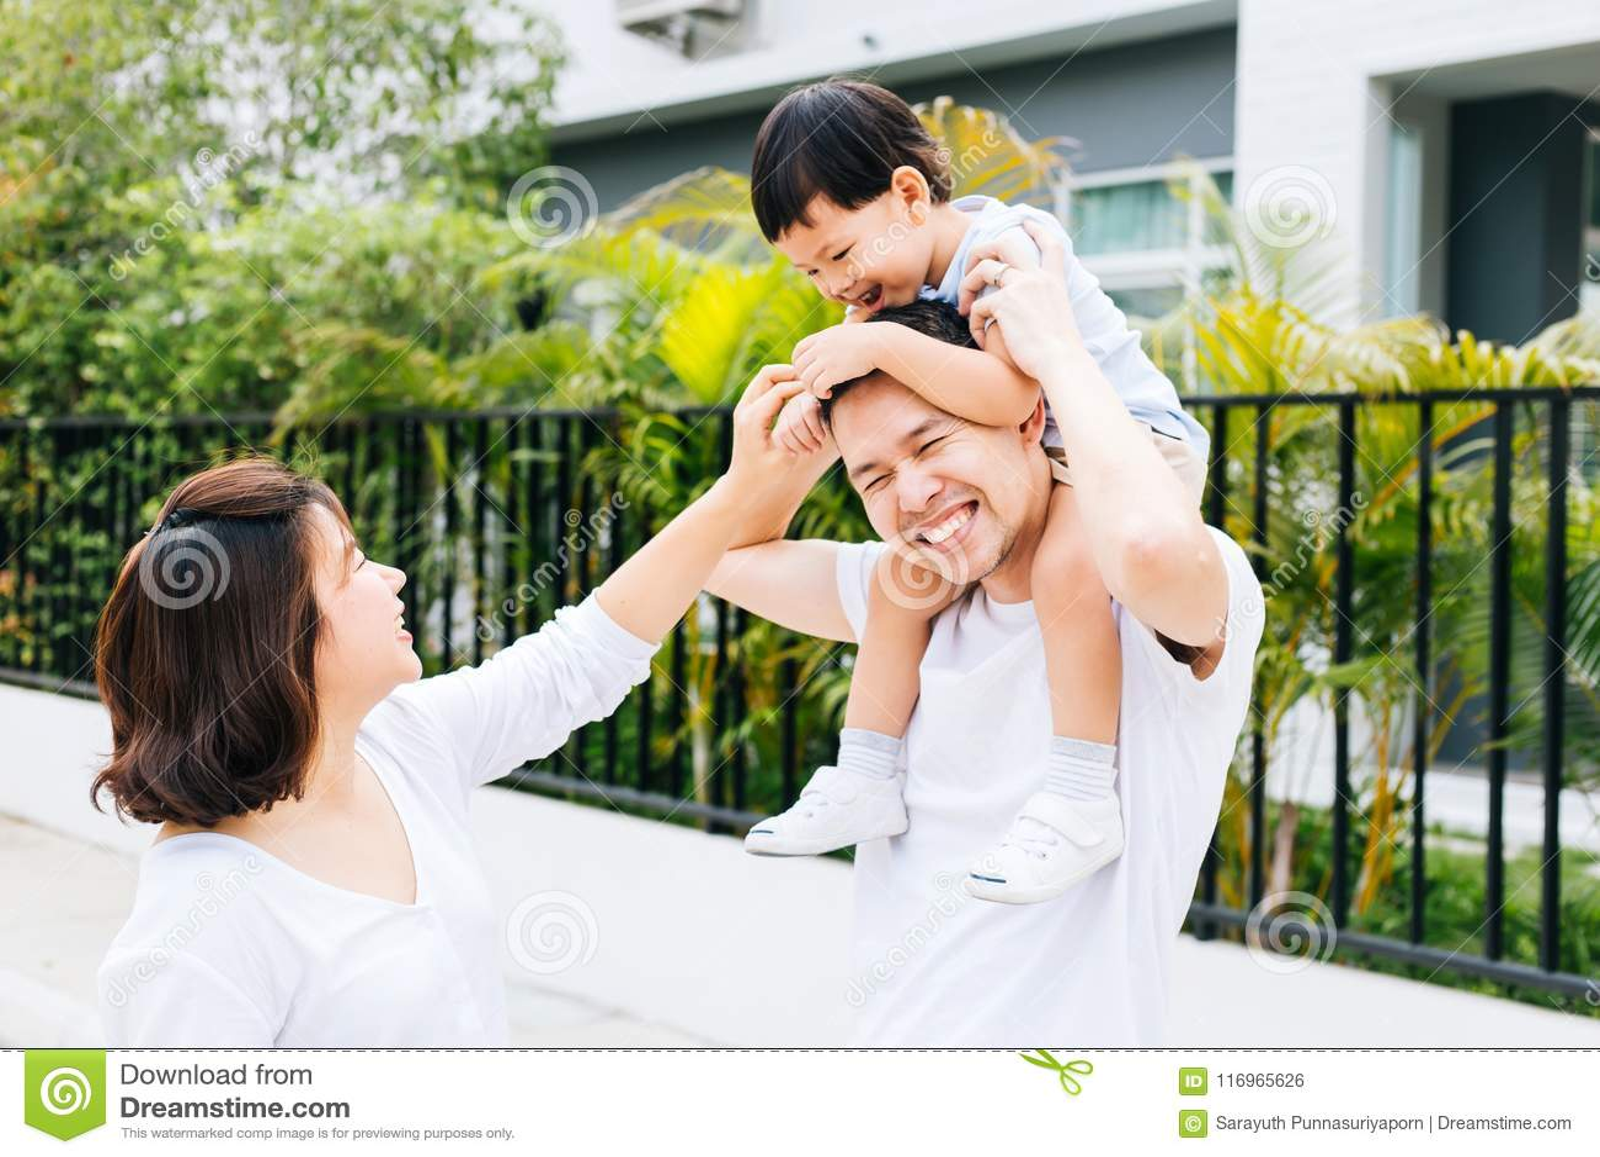 Piggbacking他的儿子的逗人喜爱的亚裔父亲与他的妻子一起在公园 花费时间的激动的家庭与幸福一起